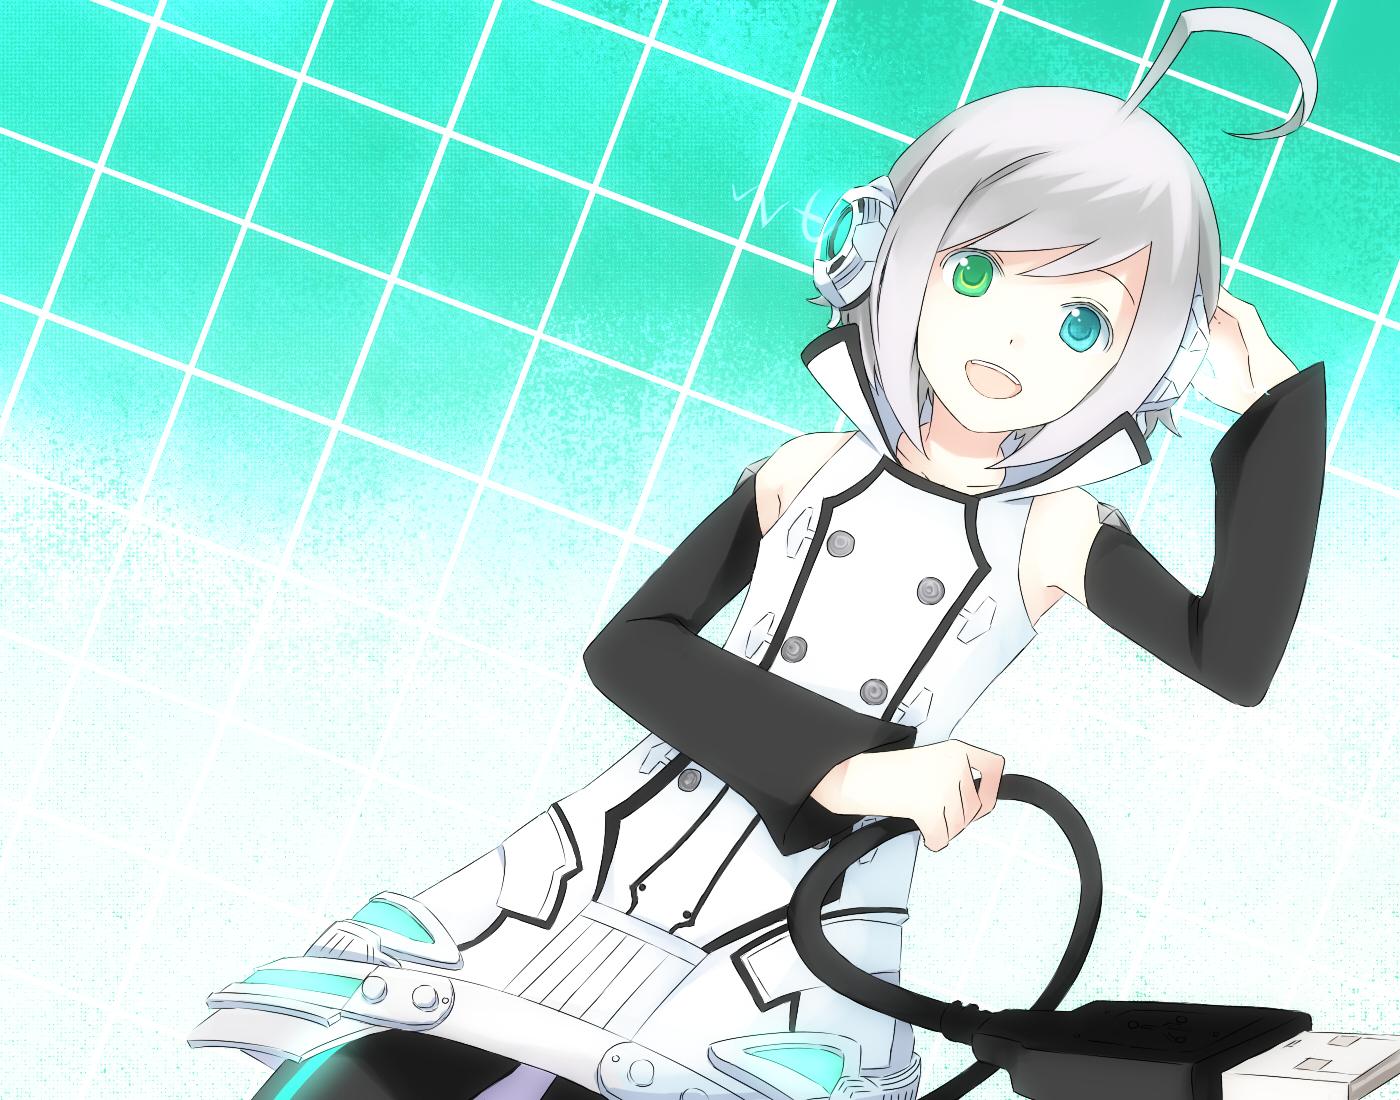 utatane piko vocaloid image 368720 zerochan anime image board